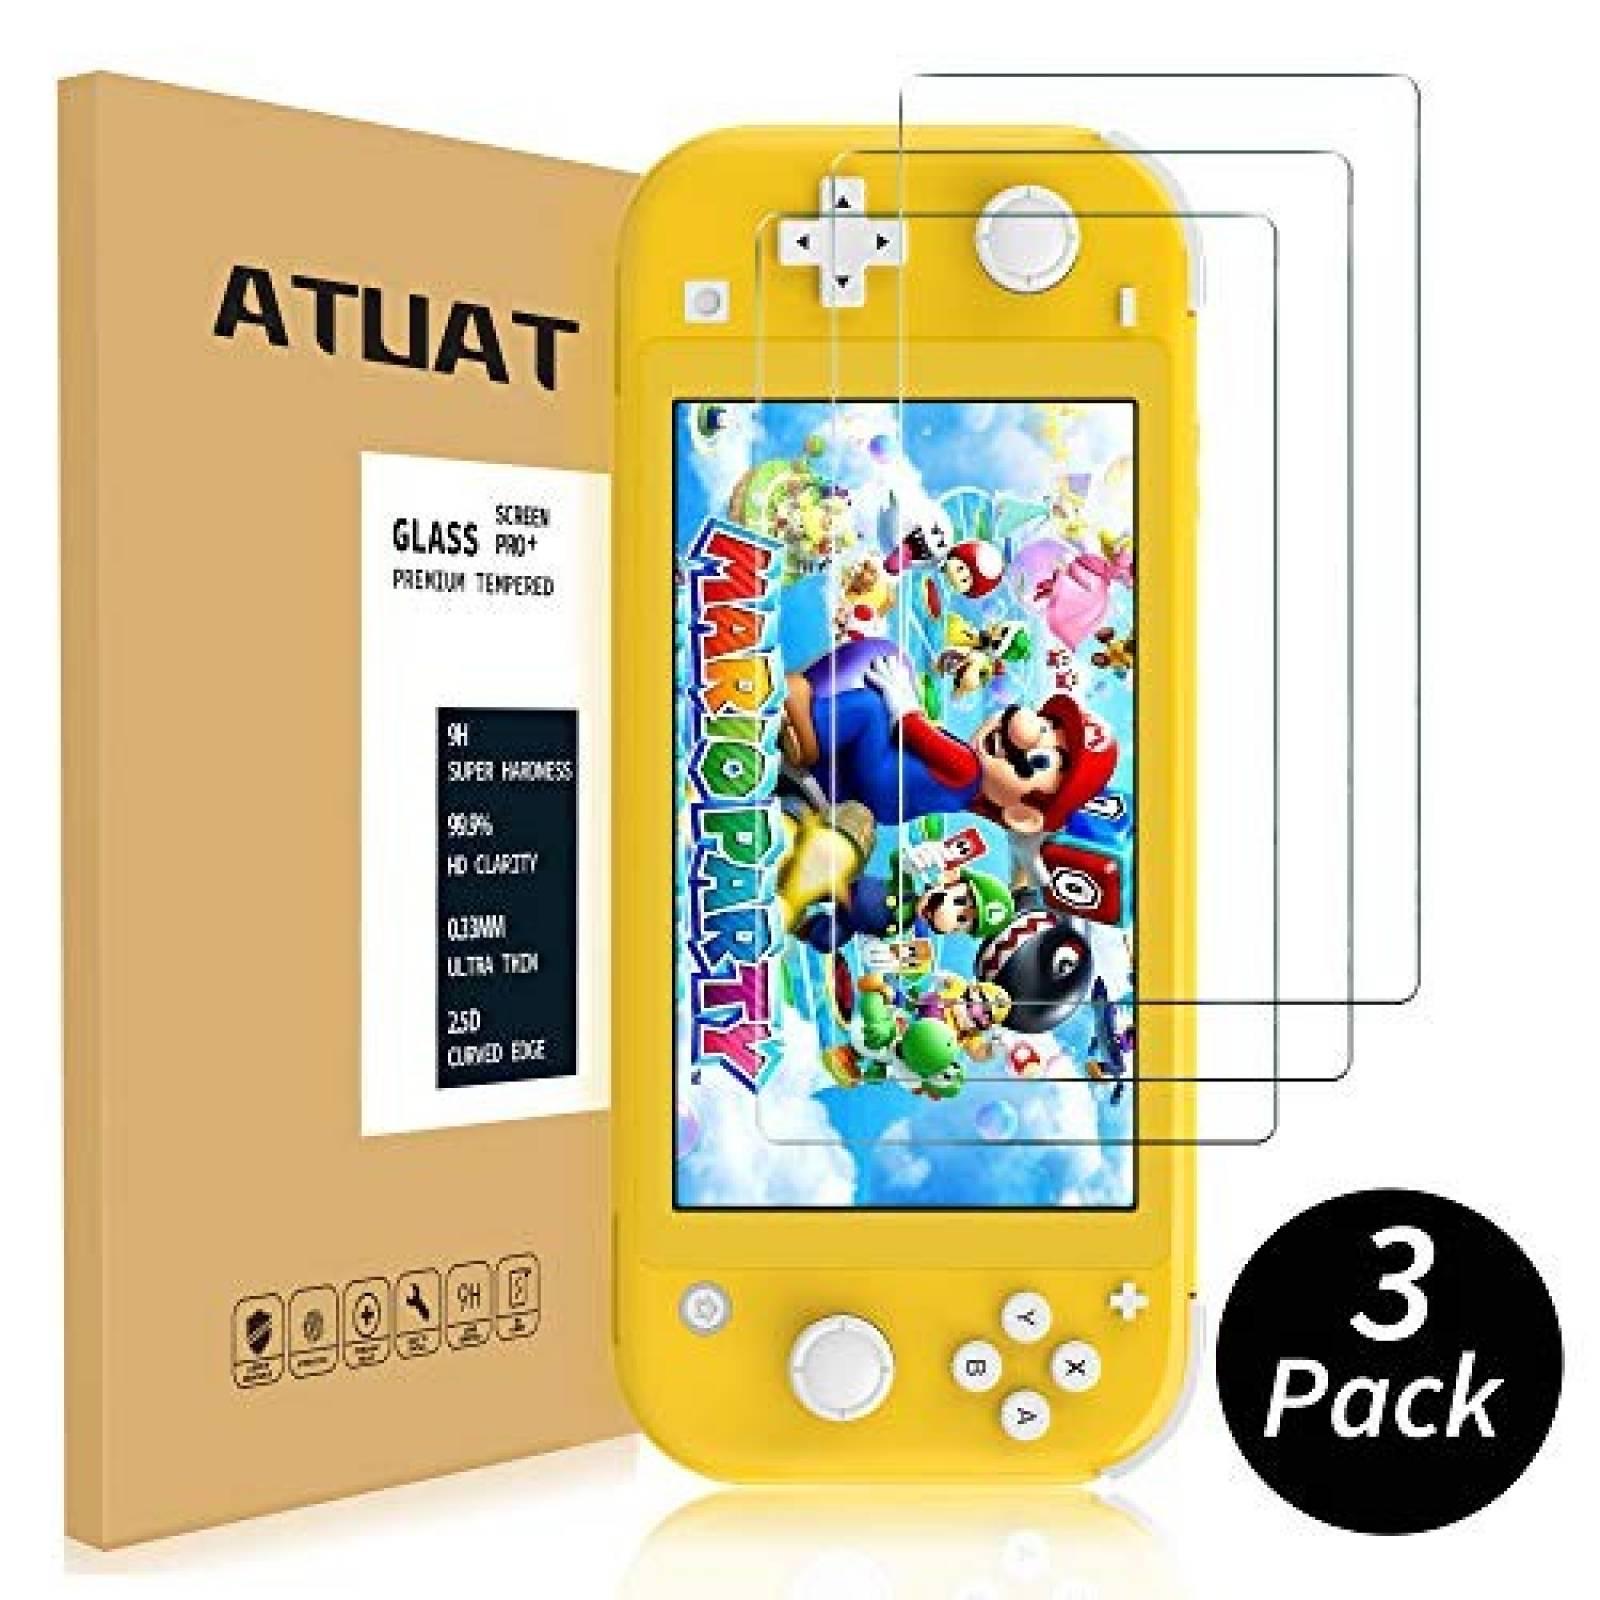 Pack protectores de pantalla ATUAT 3 pcs p/Nintendo Switch